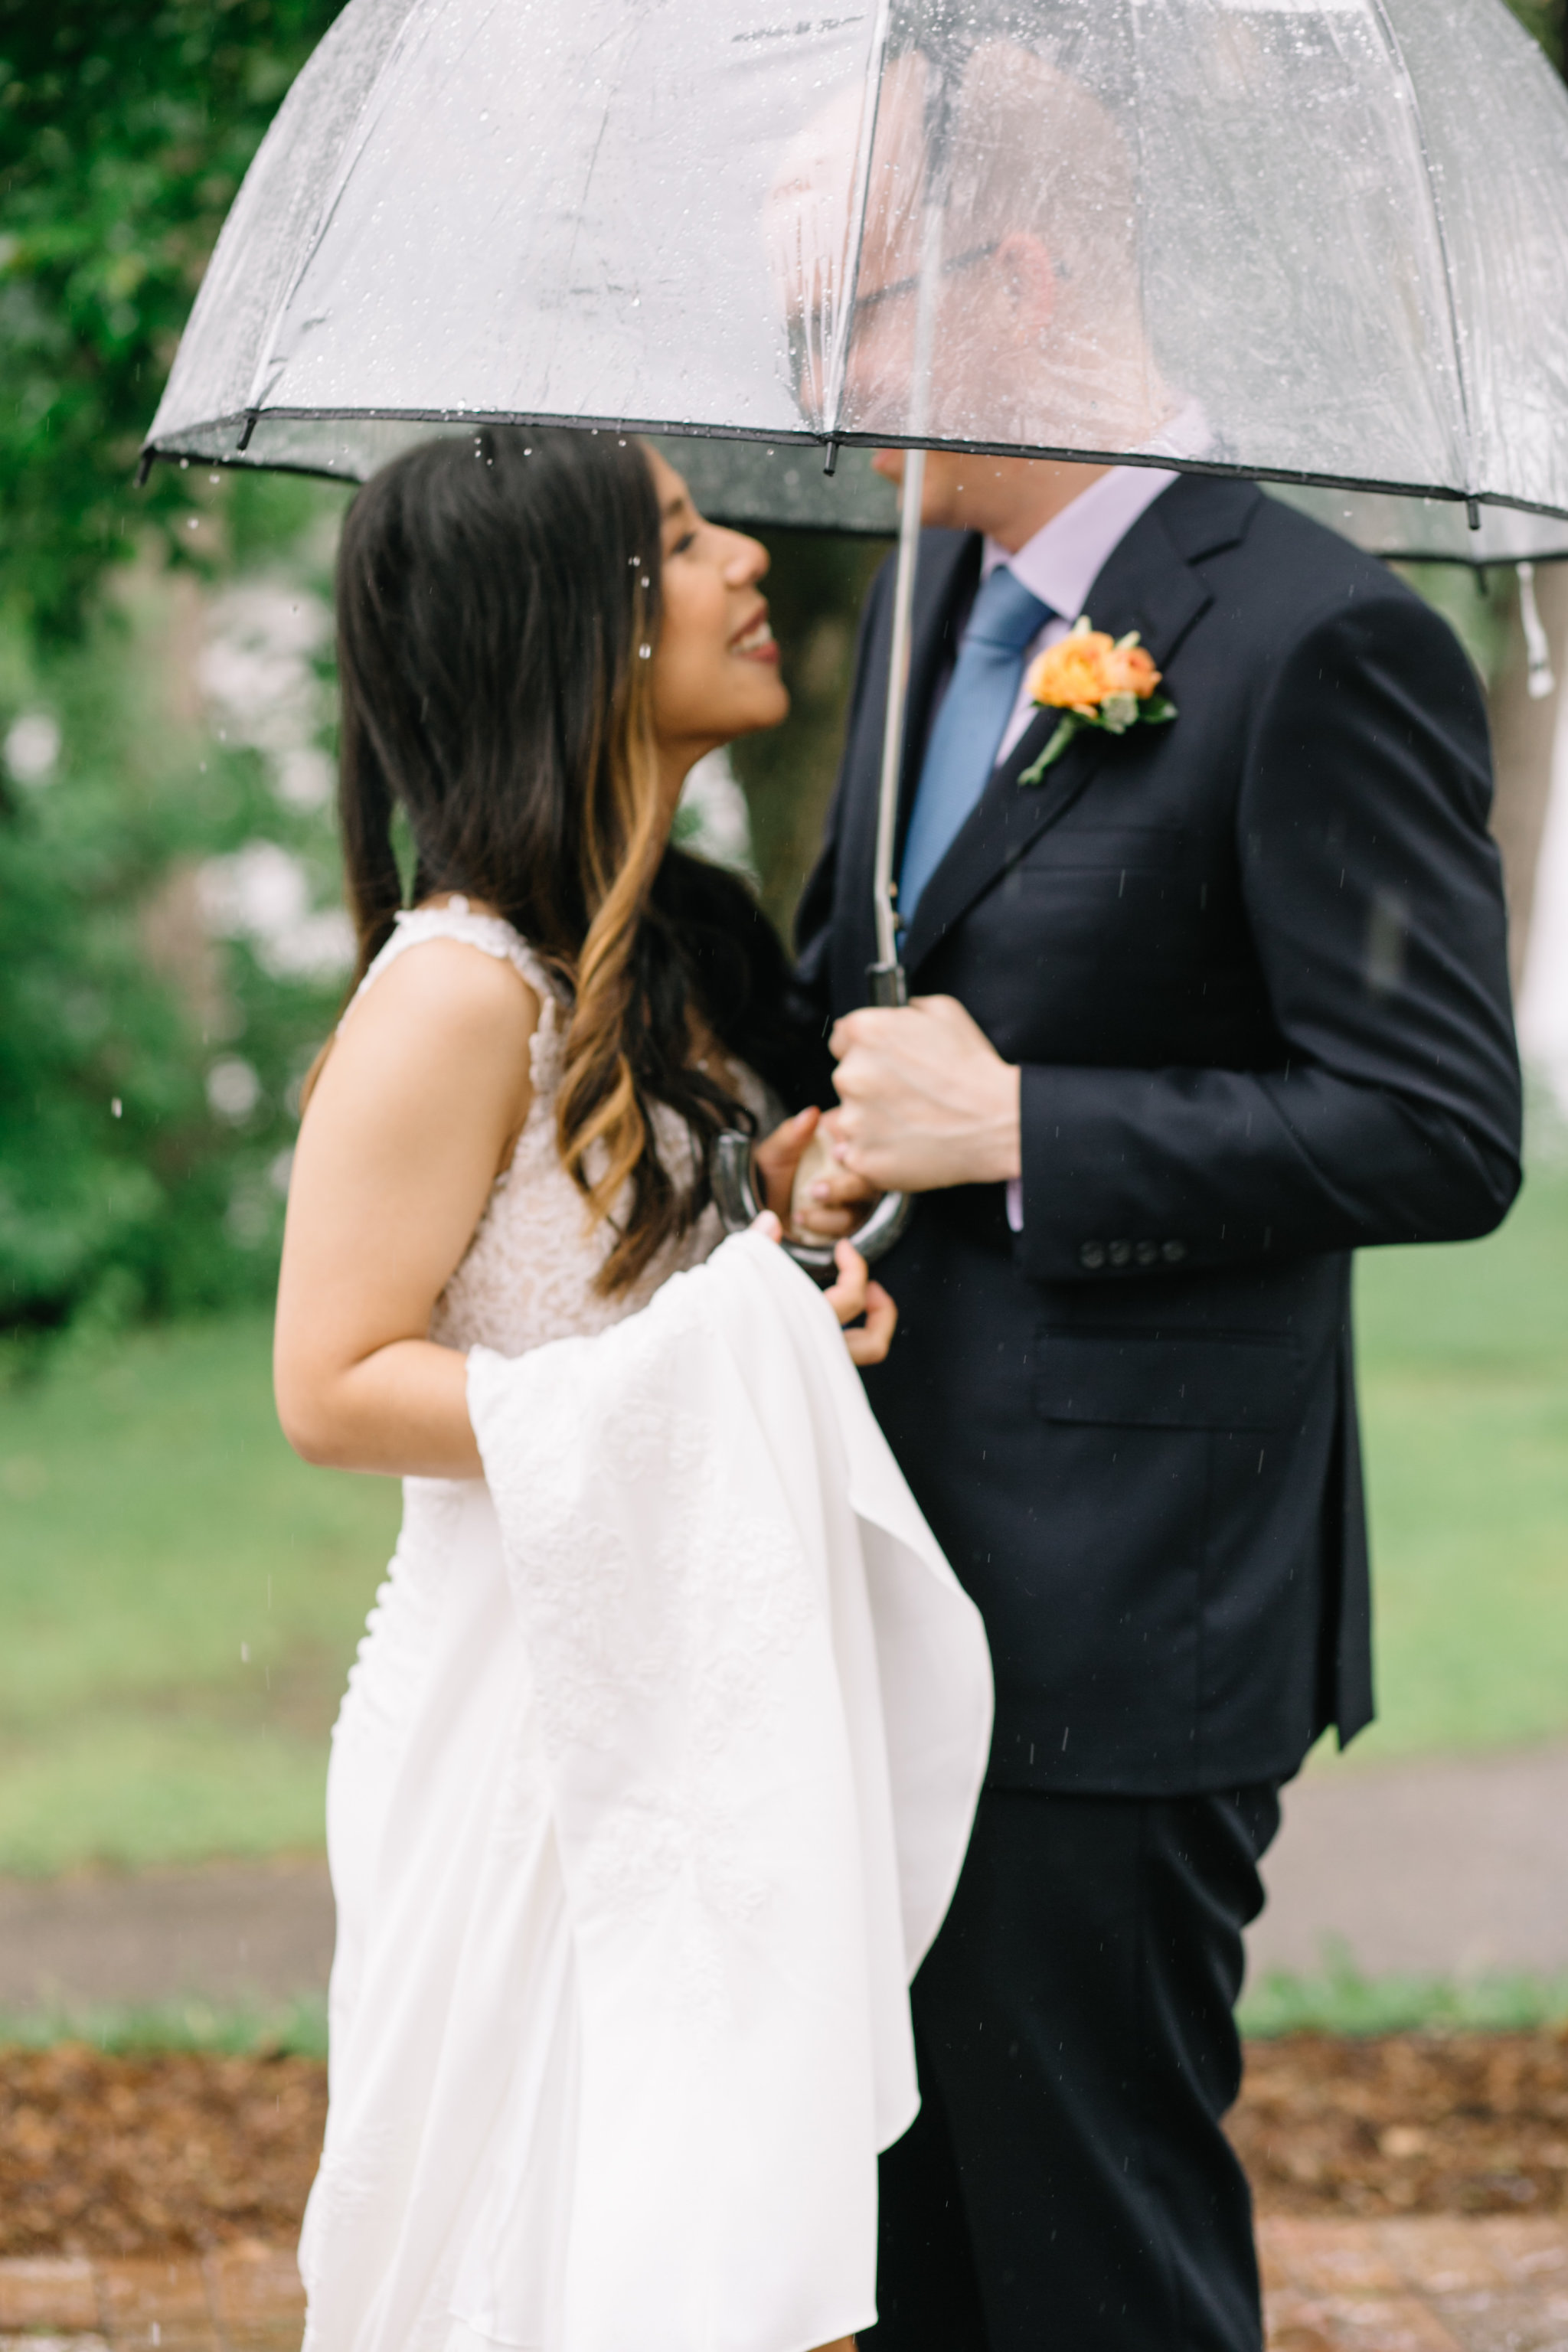 rain wedding photo, Whims and Joy Minneapolis photographer :: Sixpence Events & Planning Minnesota wedding planner :: Nicollet Island Pavilion.jpg